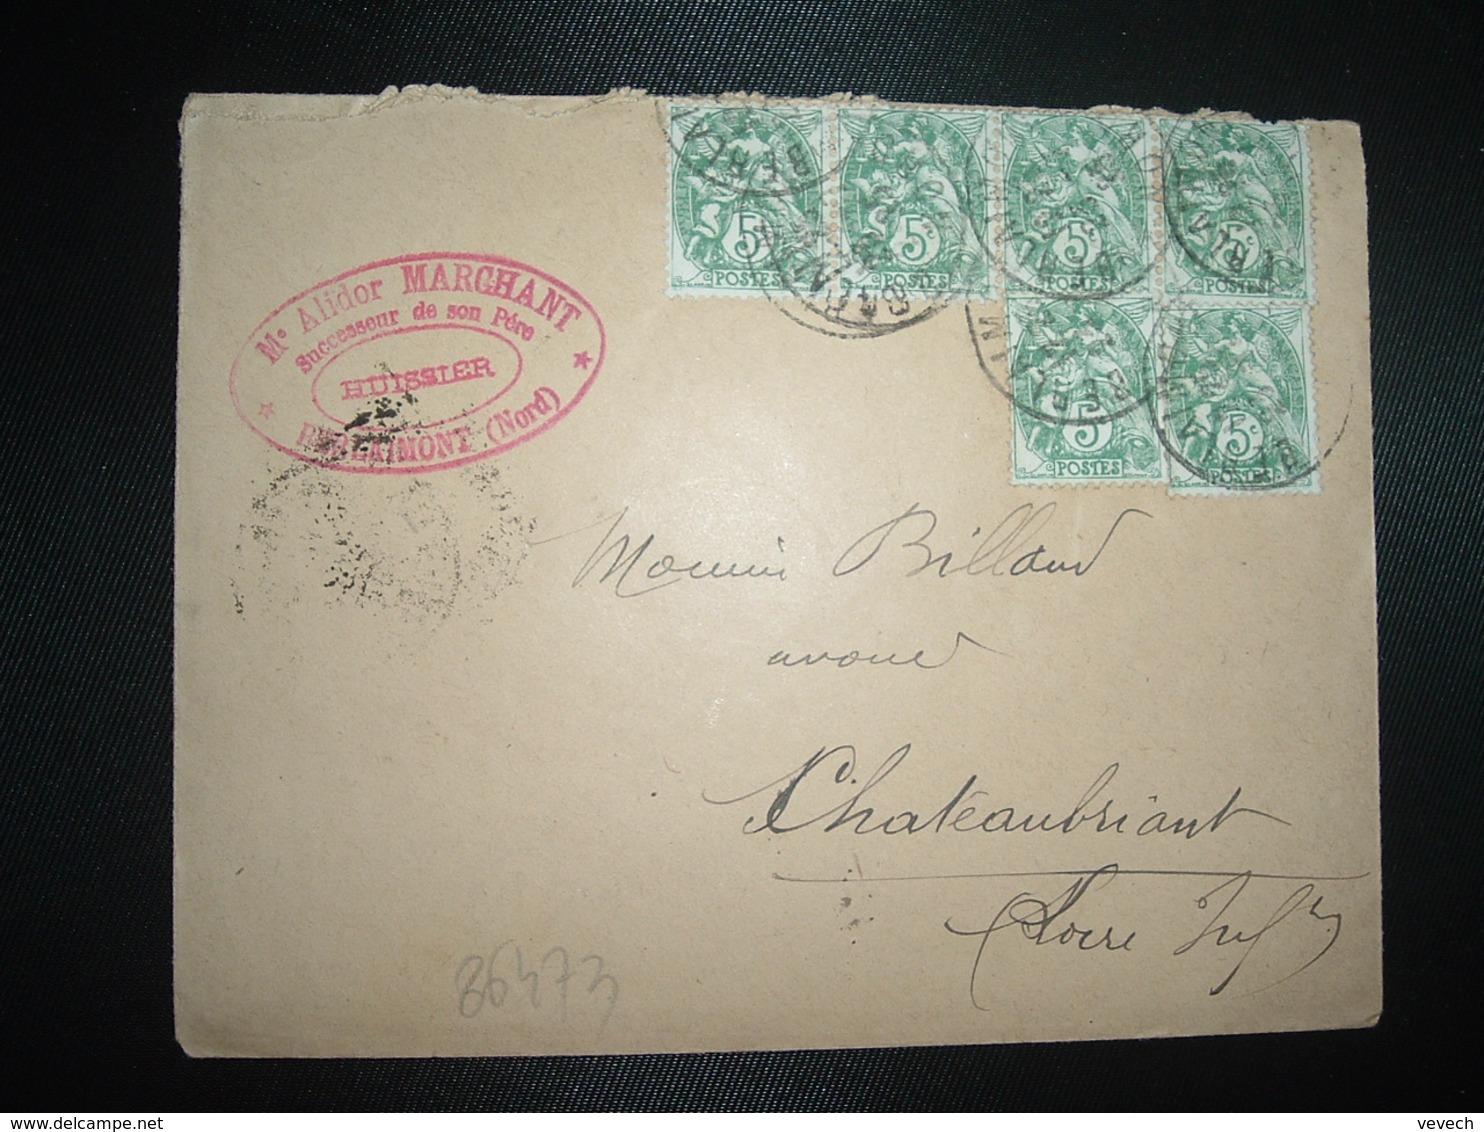 LETTRE TP BLANC 5c X6 OBL.23-7 25 BERLAIMONT NORD (59) Me Alidor MARCHANT Huissier - 1900-29 Blanc